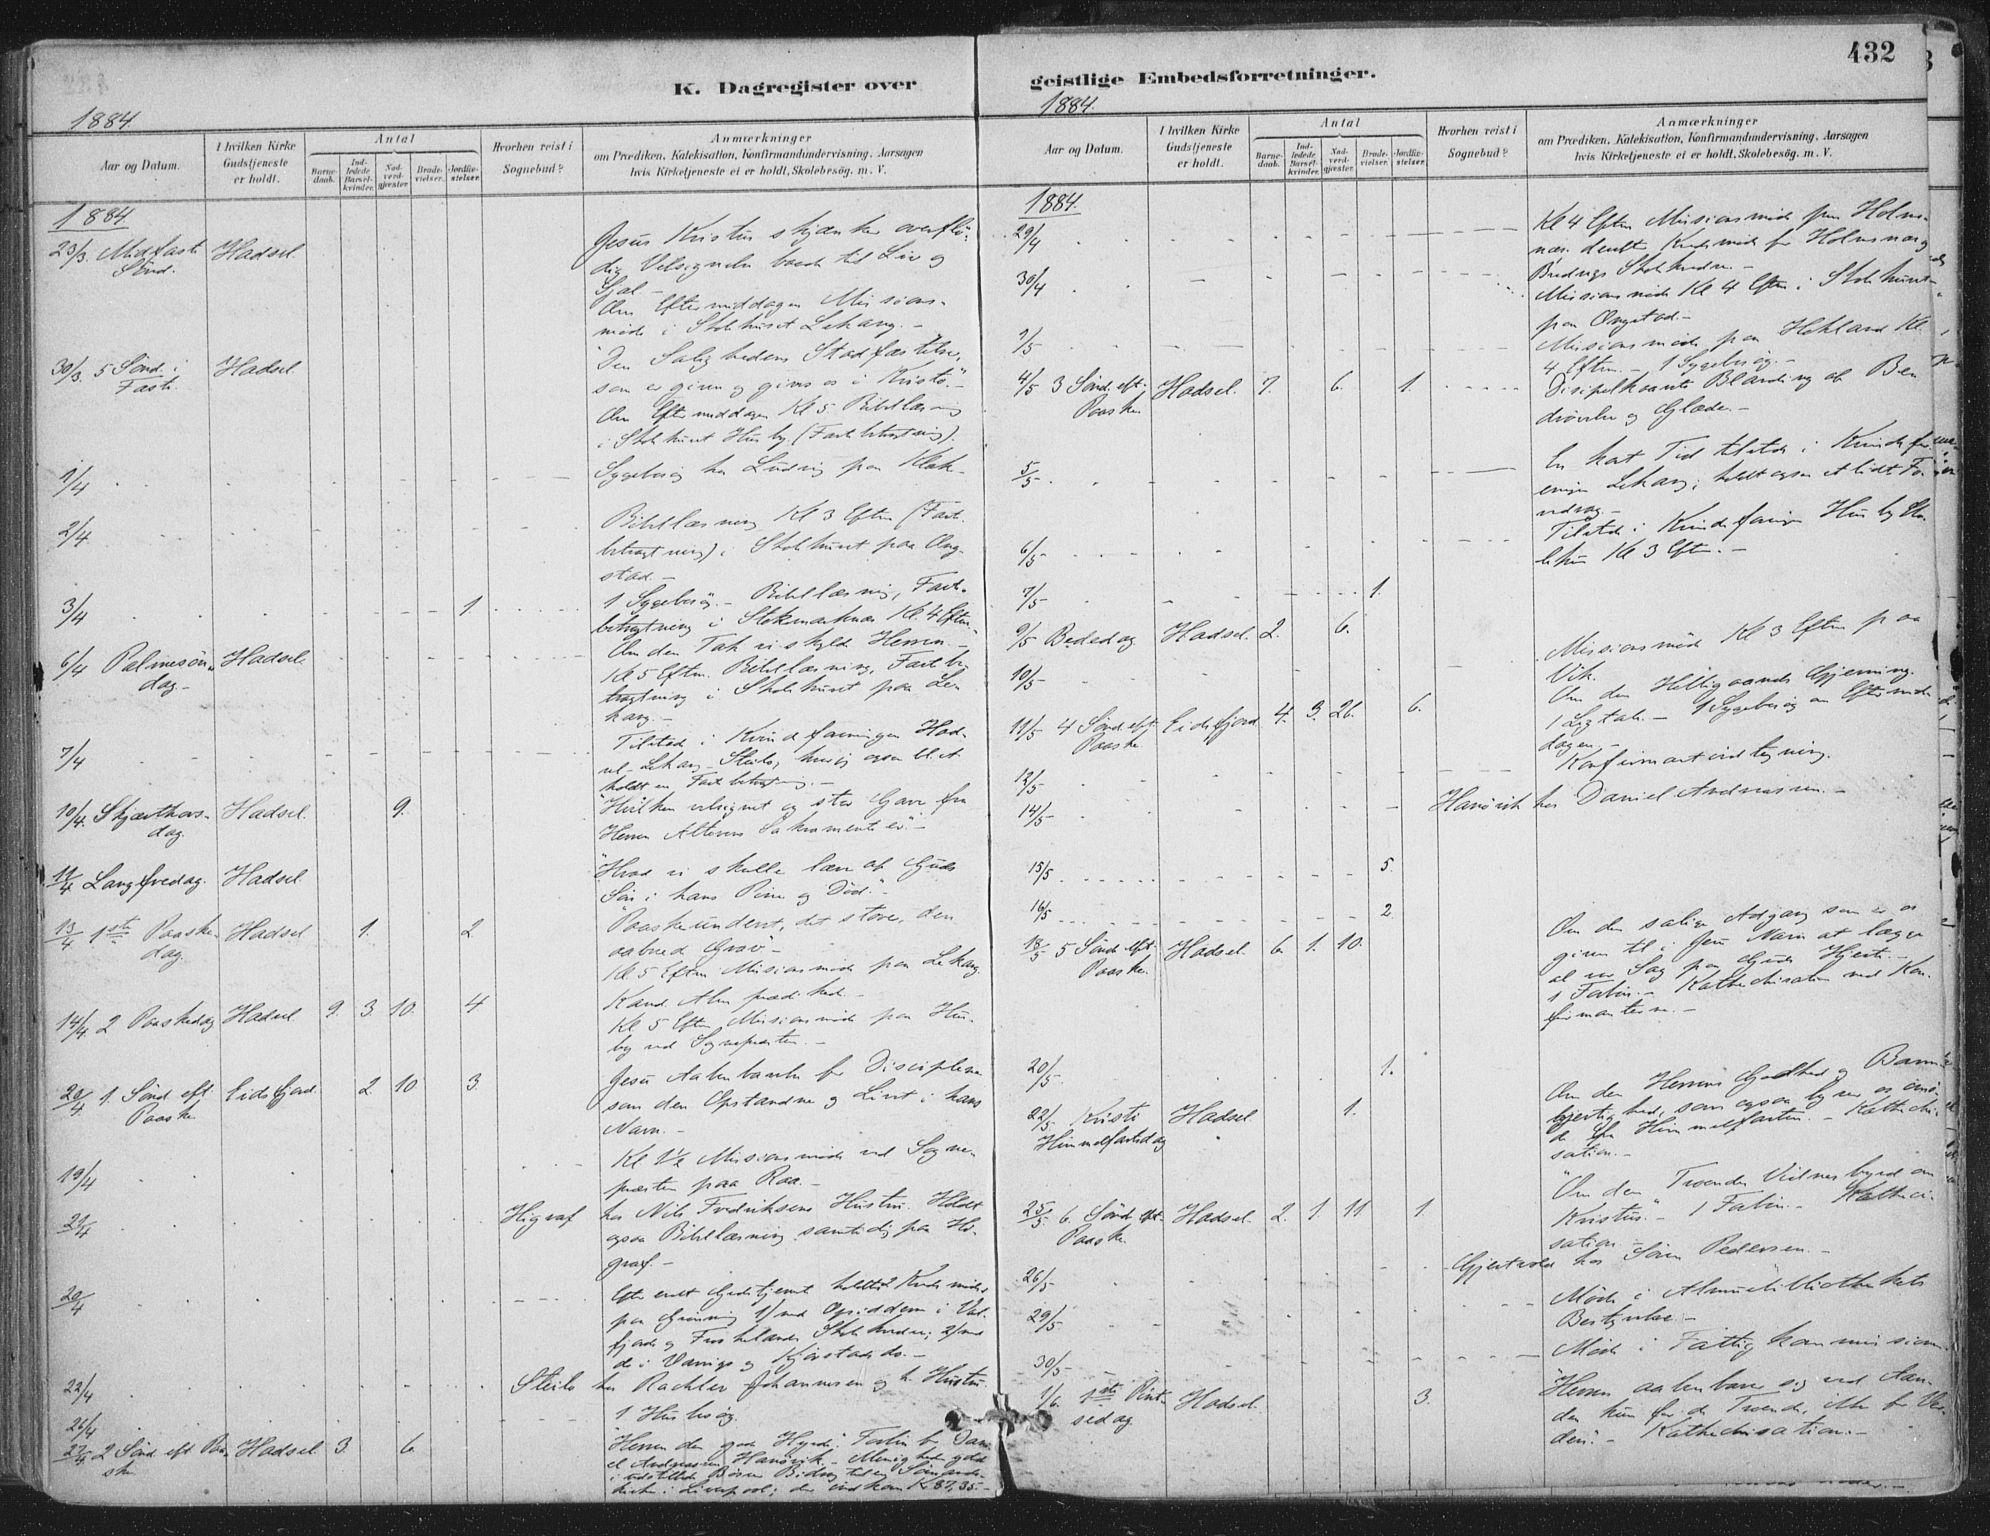 SAT, Ministerialprotokoller, klokkerbøker og fødselsregistre - Nordland, 888/L1244: Ministerialbok nr. 888A10, 1880-1890, s. 432